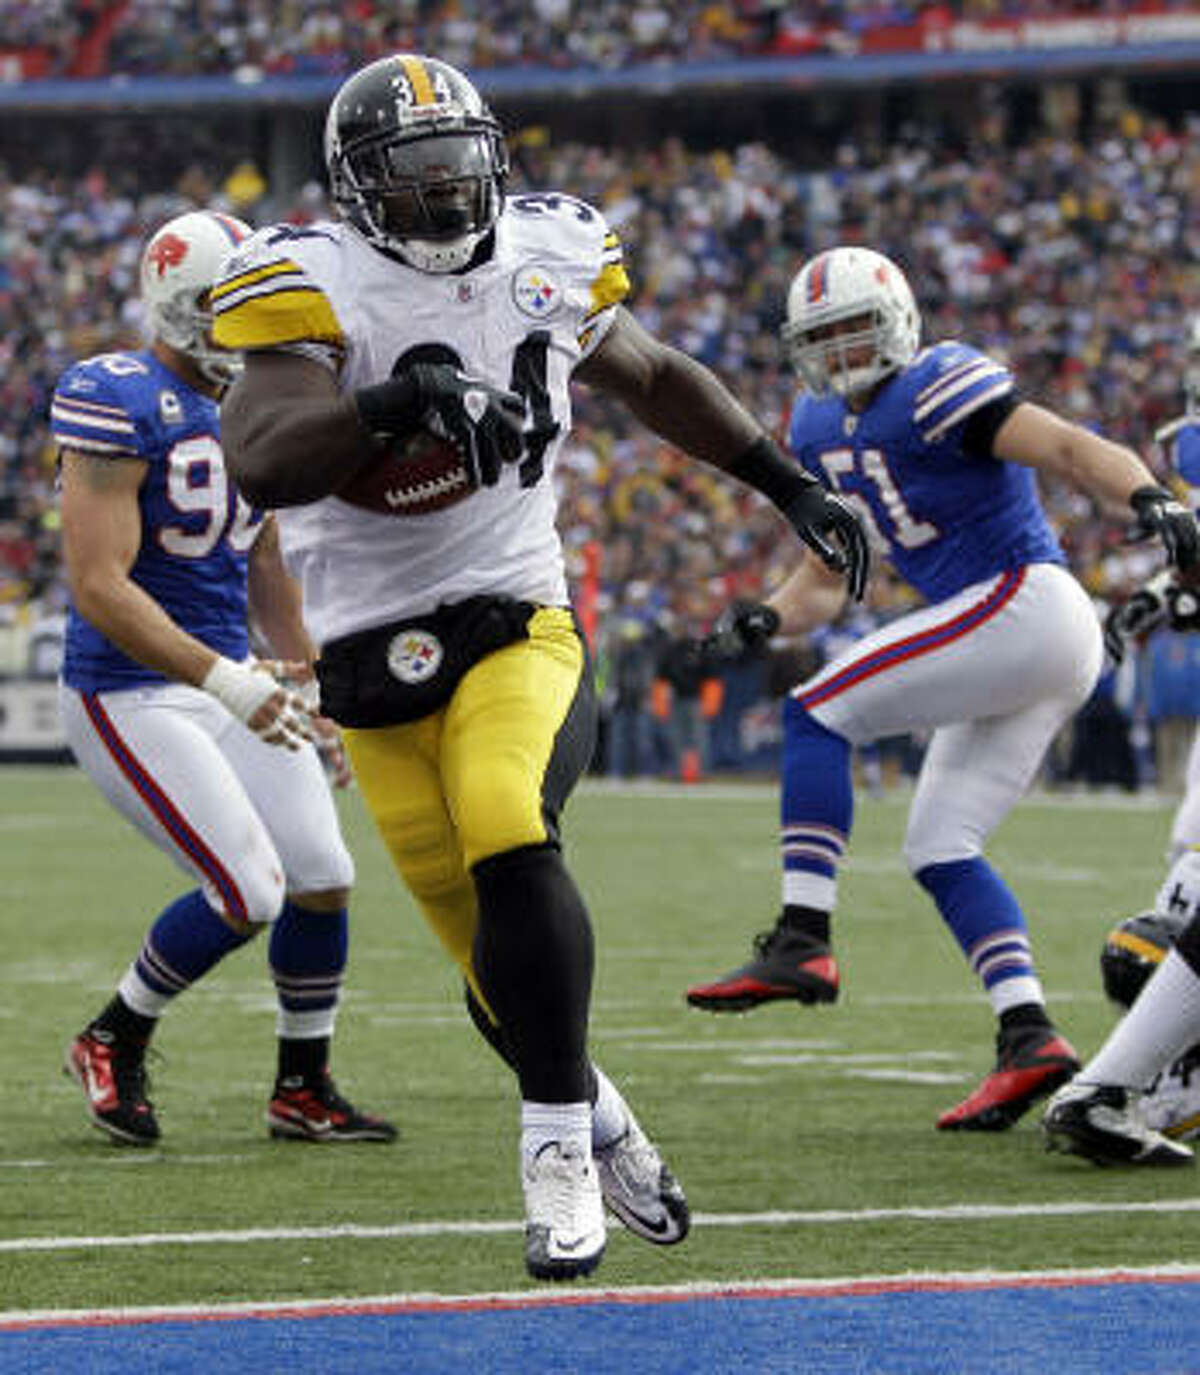 Steelers 19, Bills 16 (OT) Steelers running back Rashard Mendenhall (34) runs for a touchdown during the first half.